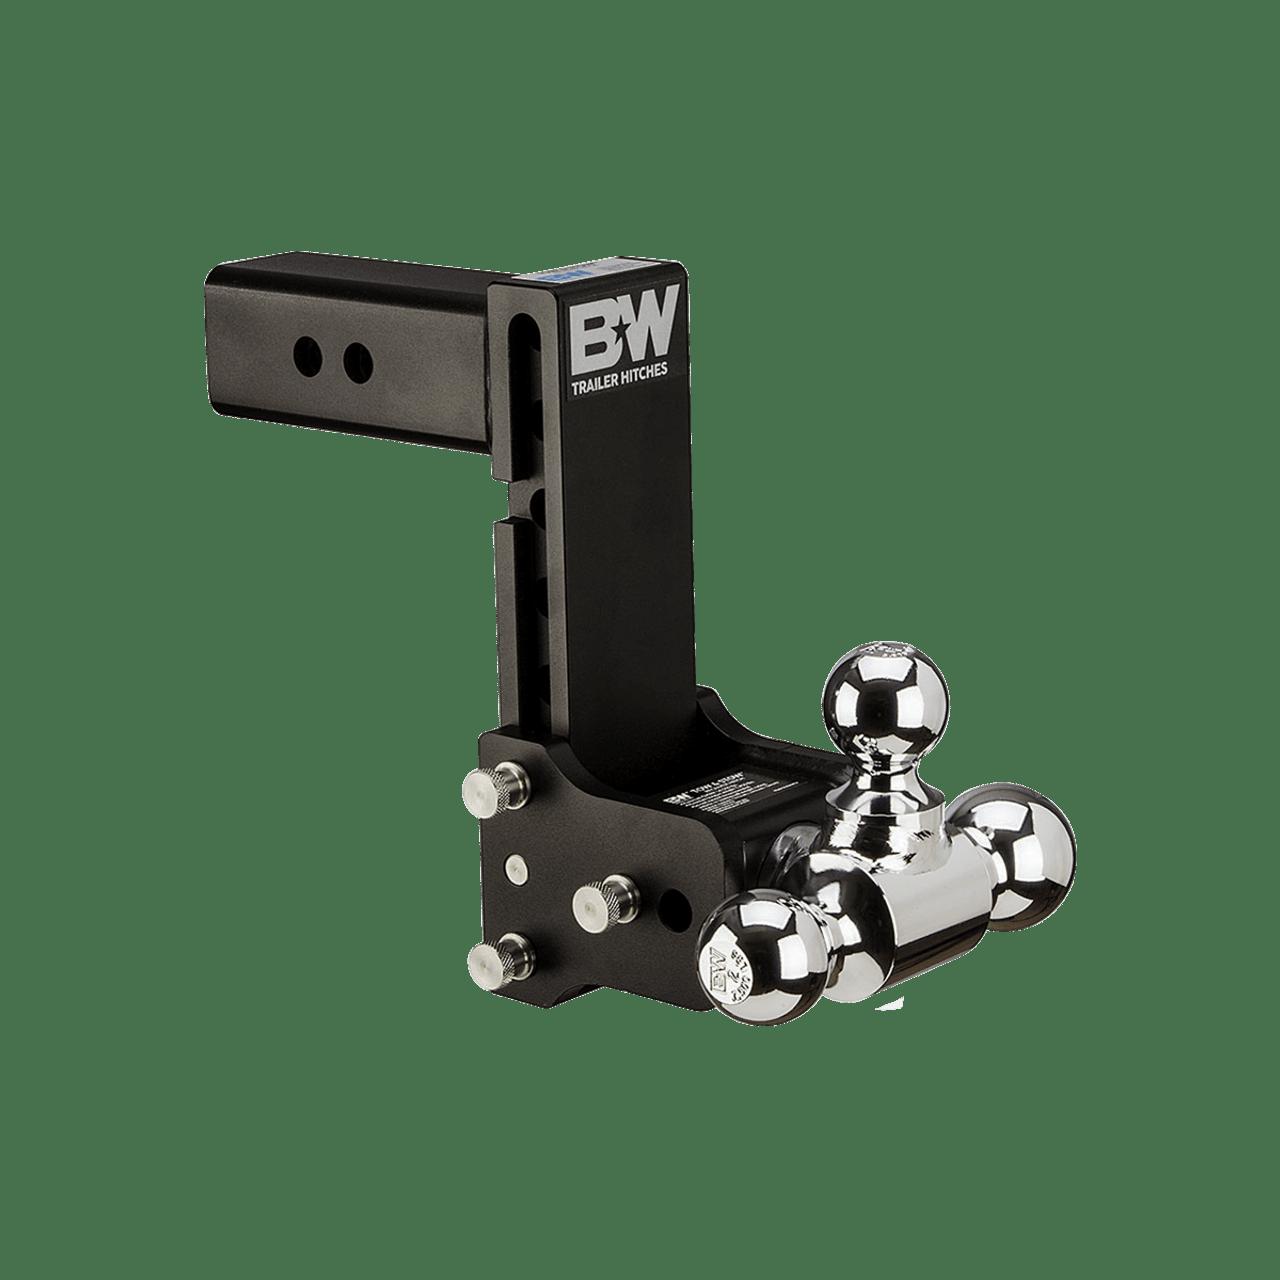 "BW20049B --- B&W 2.5"" Shank Tow and Stow Adjustable Tri-Ball Mount, 7"" Maximum Drop"